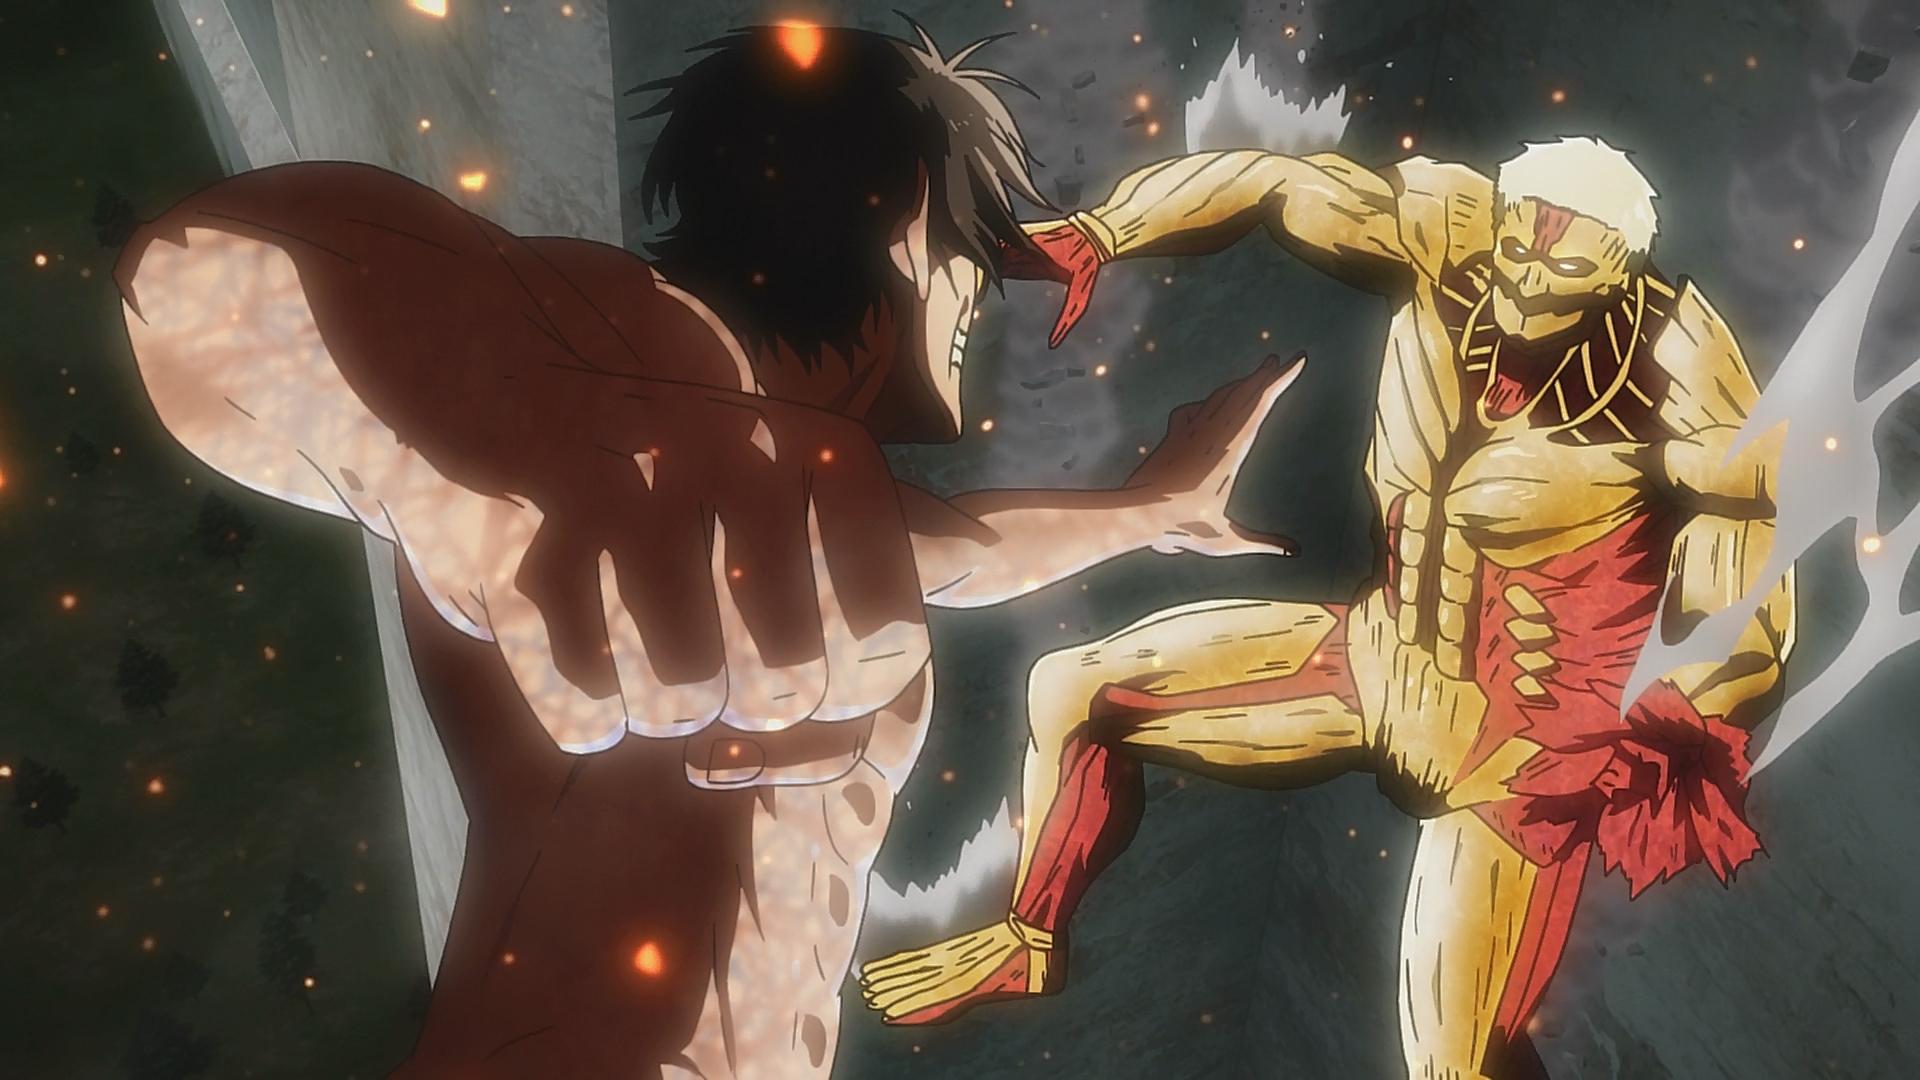 eren titan reveal episode Warrior (Episode)  Attack on Titan Wiki  Fandom